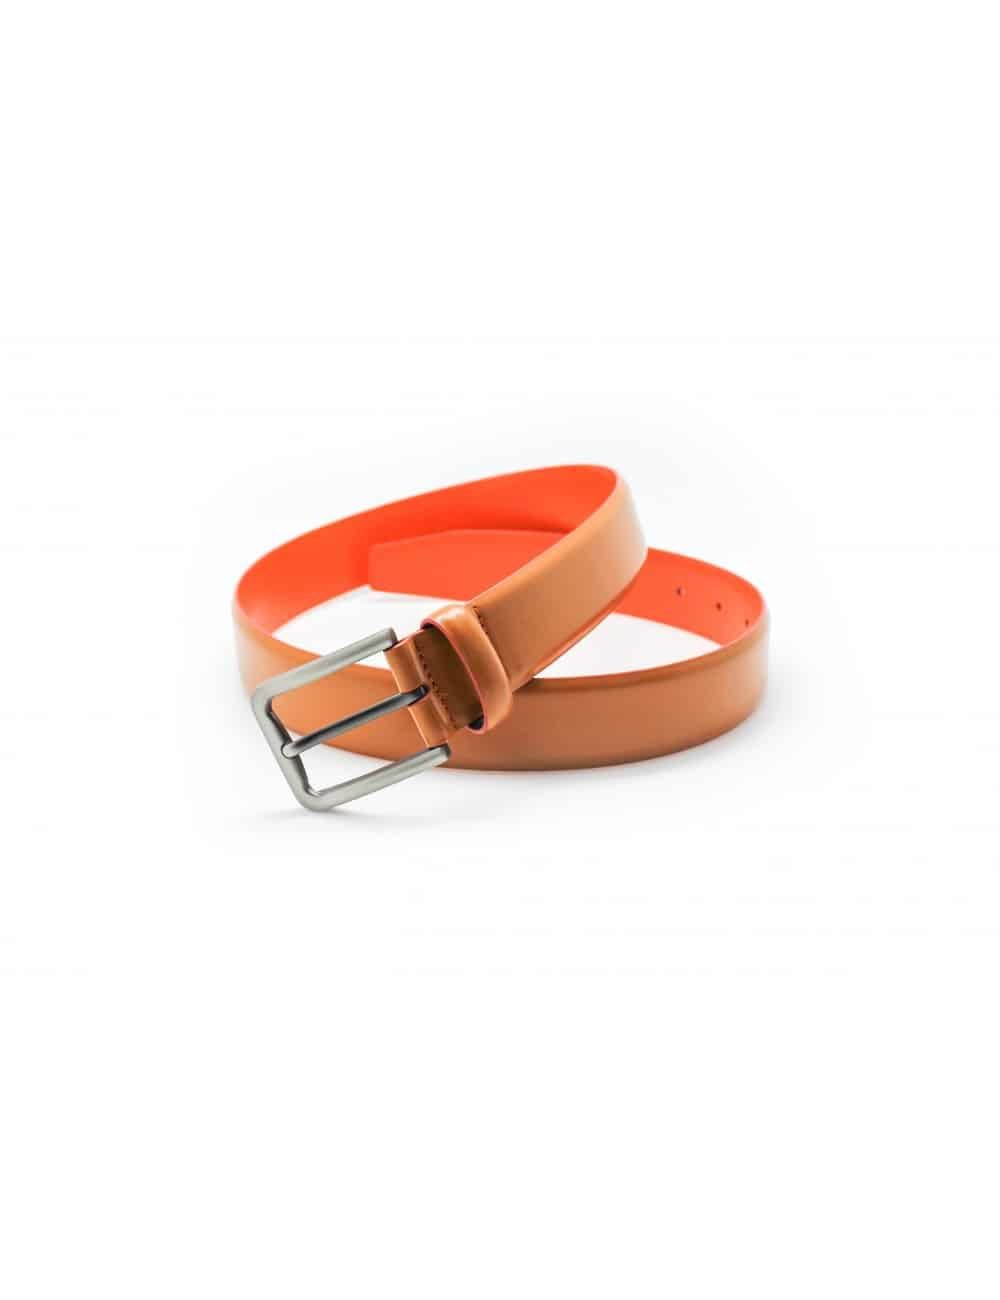 Tan & Orange Leather Belt LB4.5